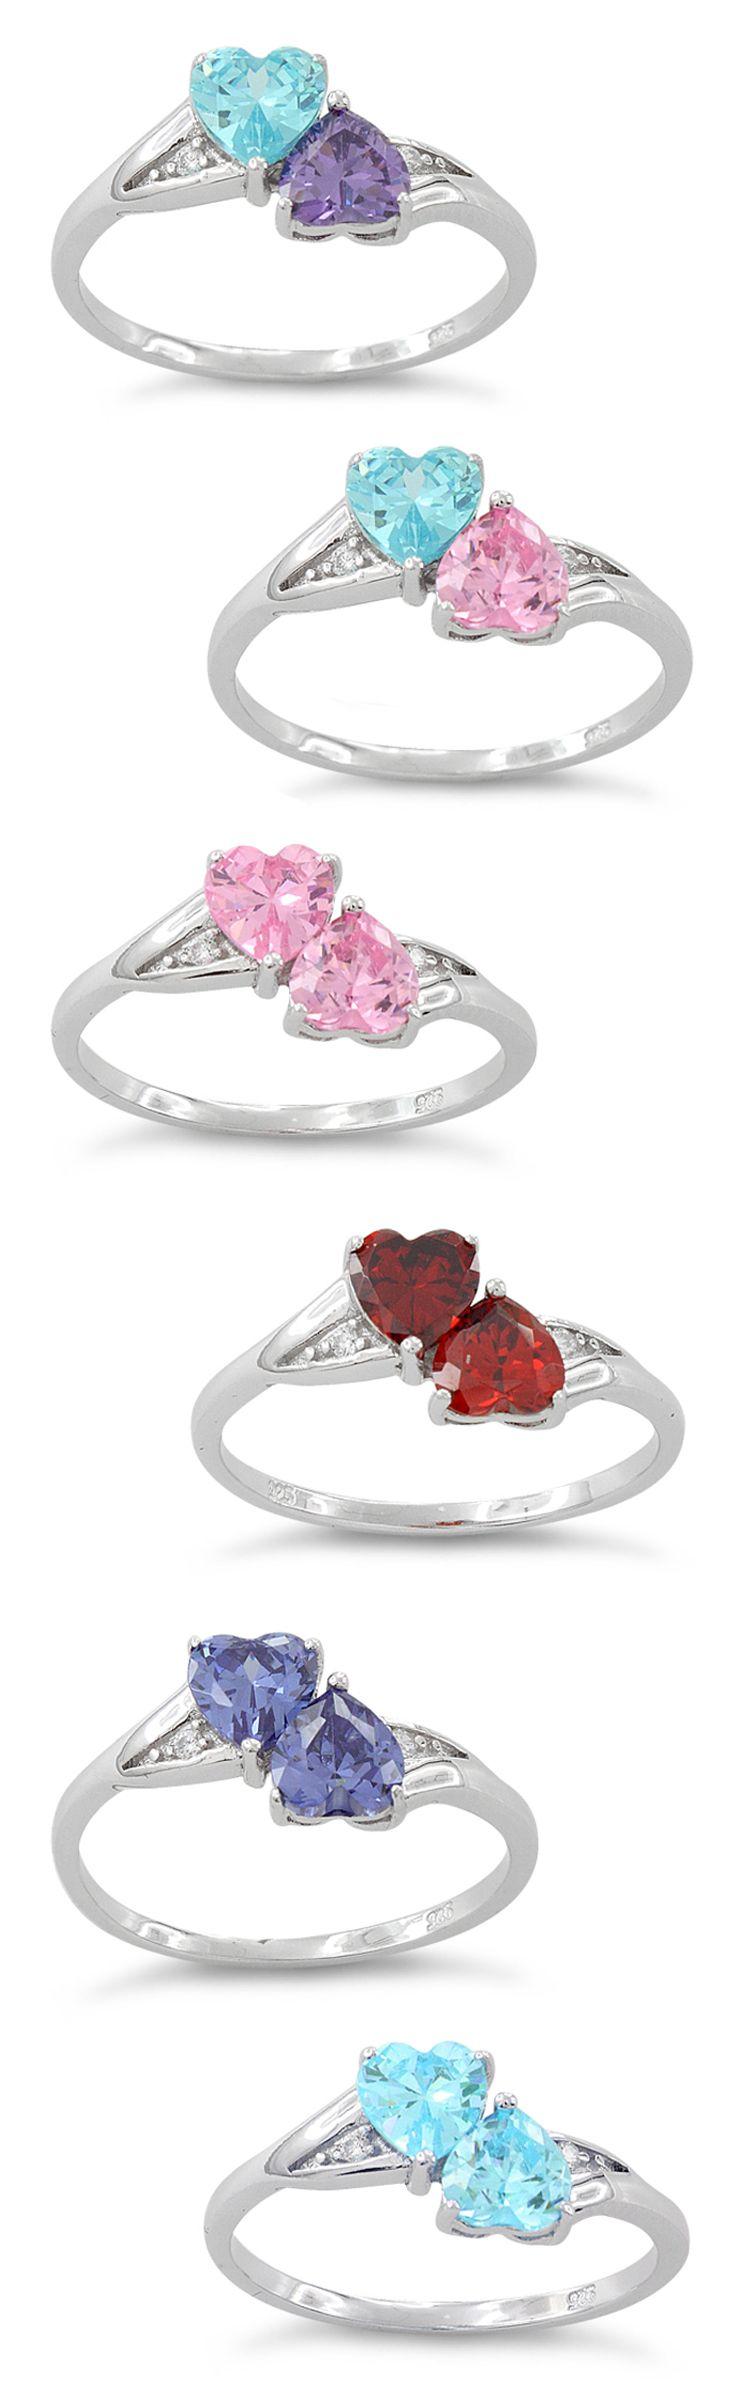 Sterling Silver CZ Double Heart Rings